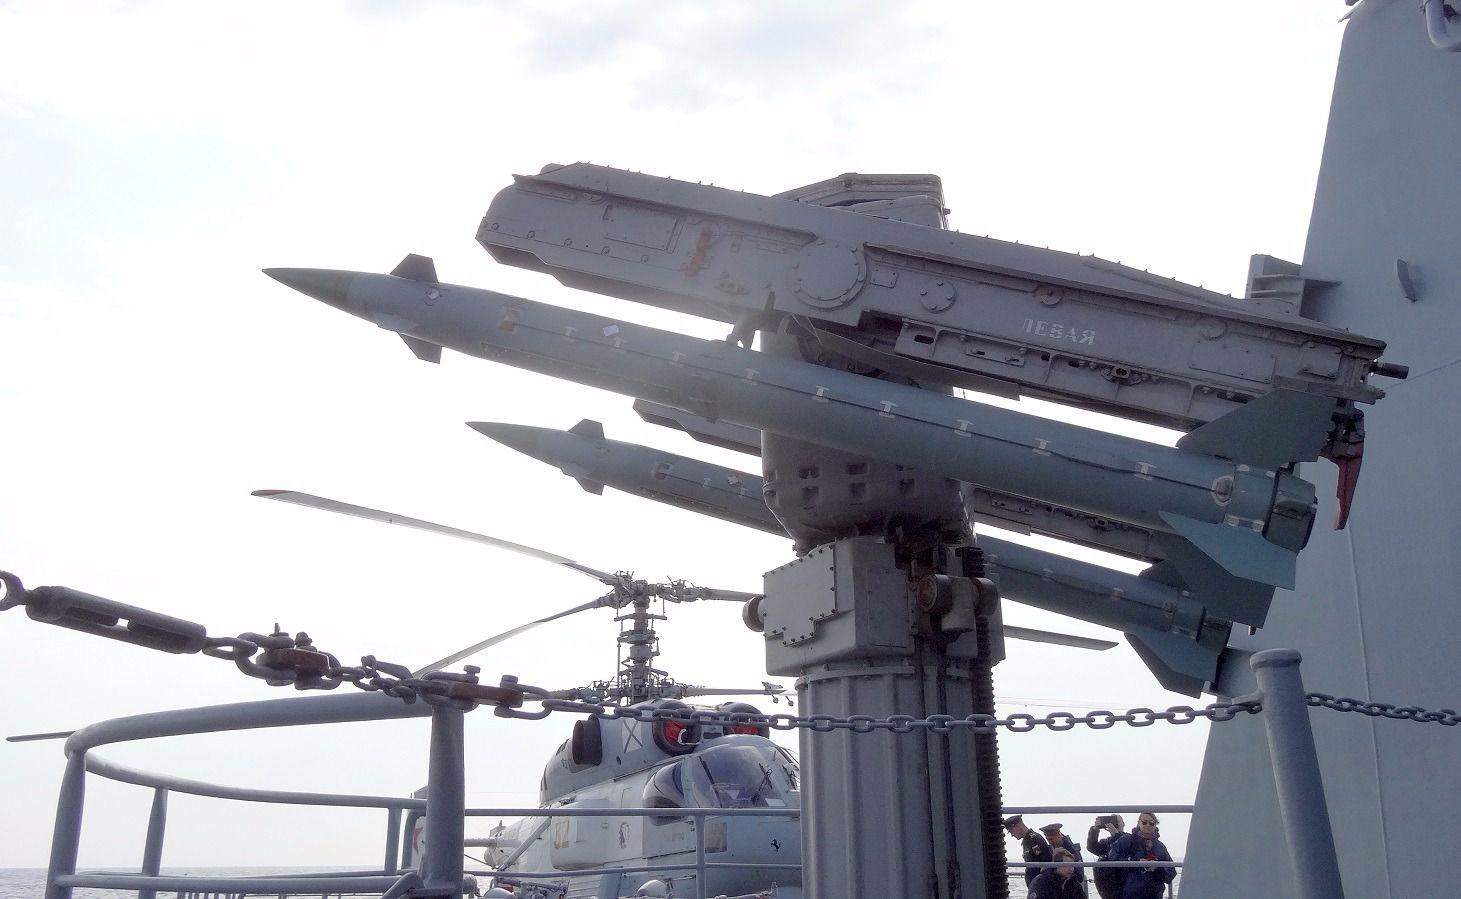 Russian Navy Cruiser.